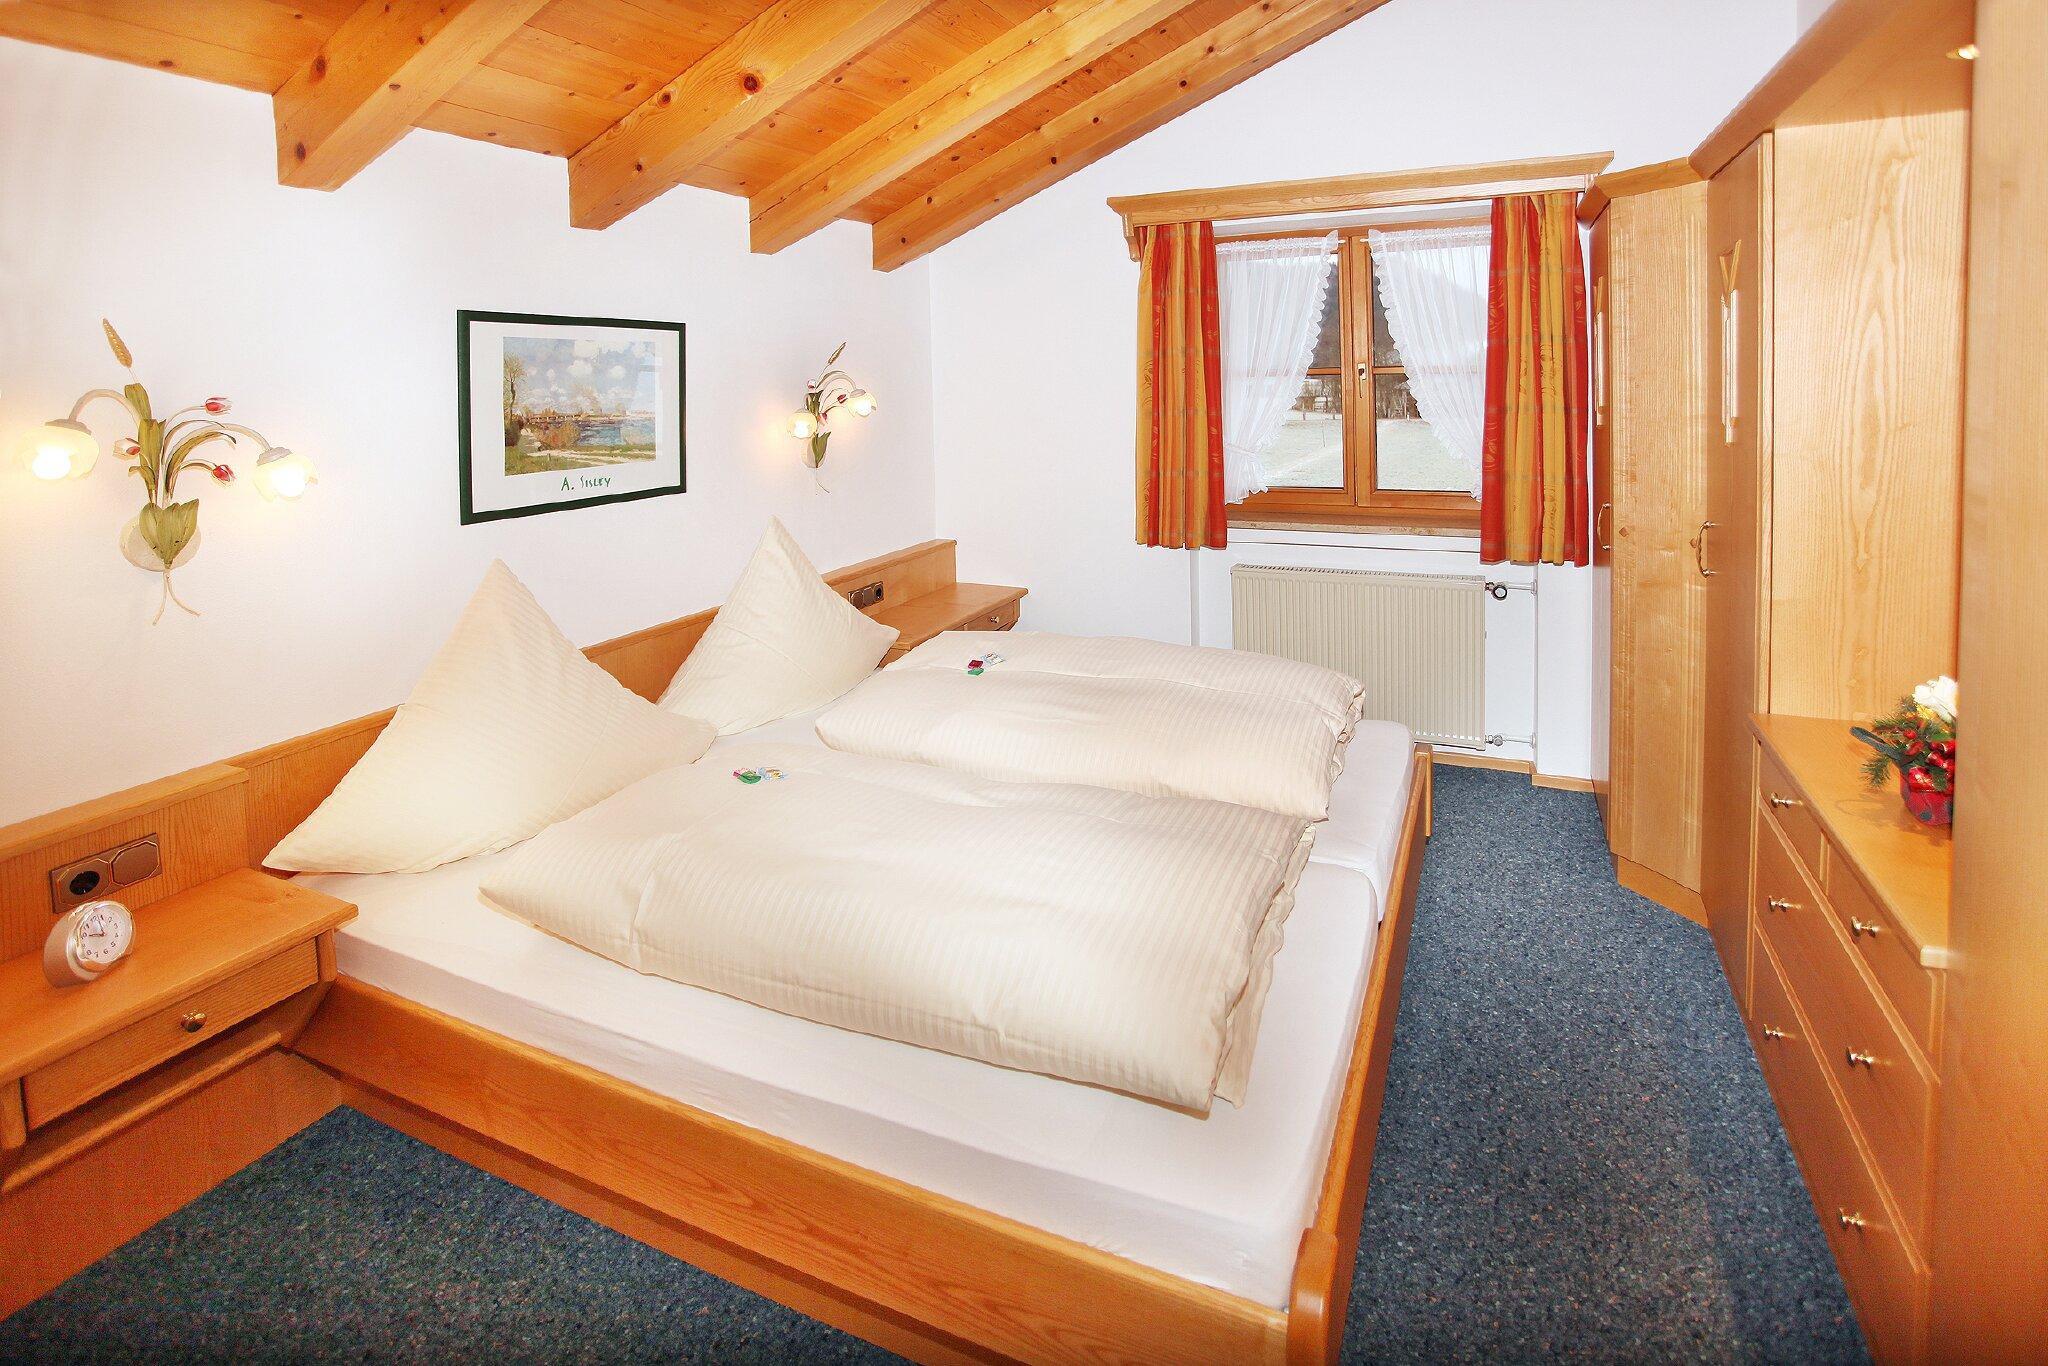 Schlafzimmer Whg. Nr. 4